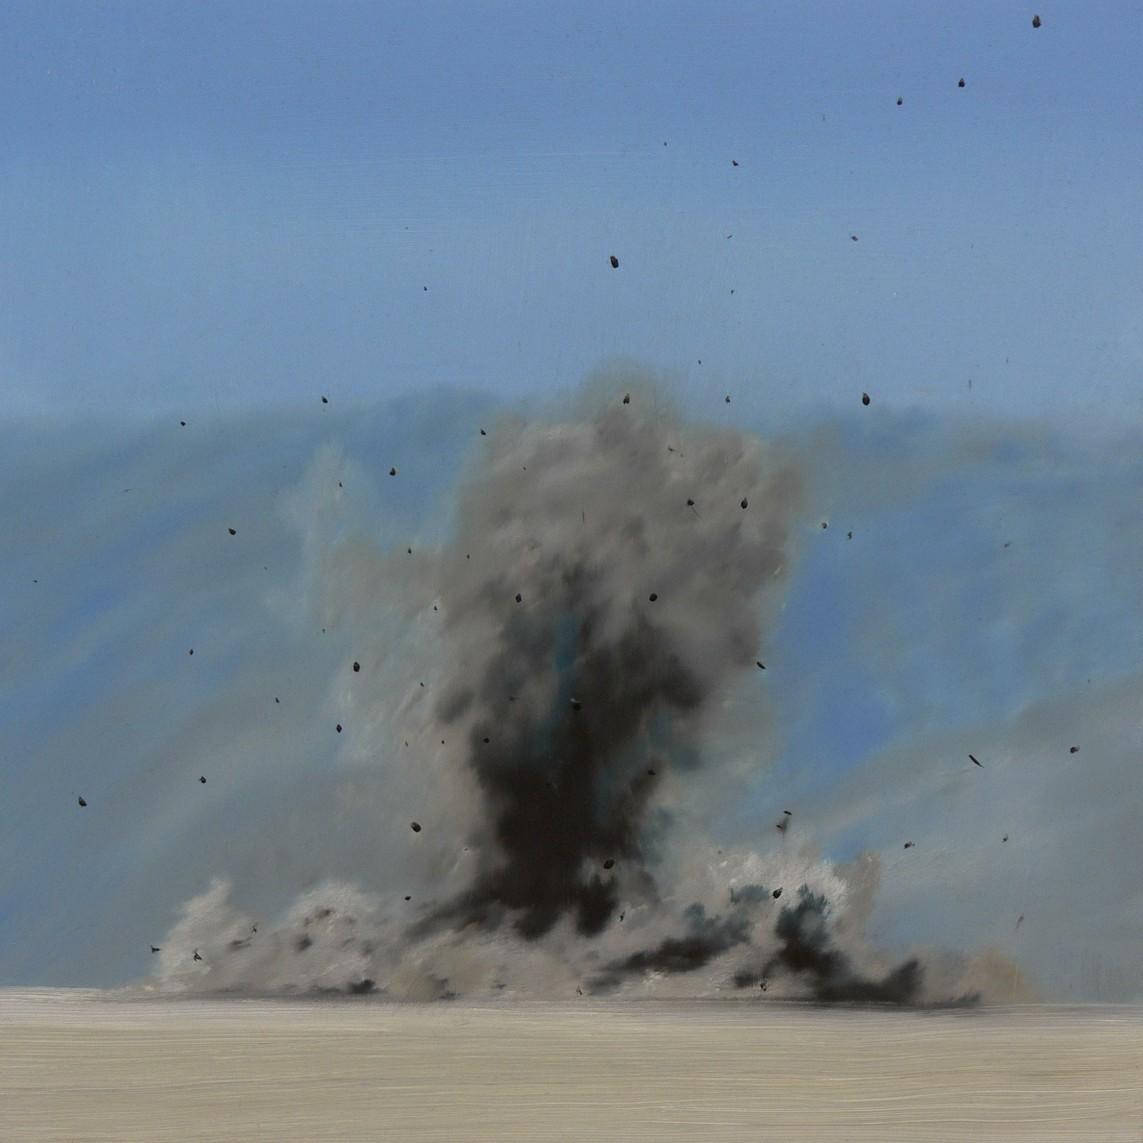 Granate // 2010, Öl auf mdf, 40x40 cm